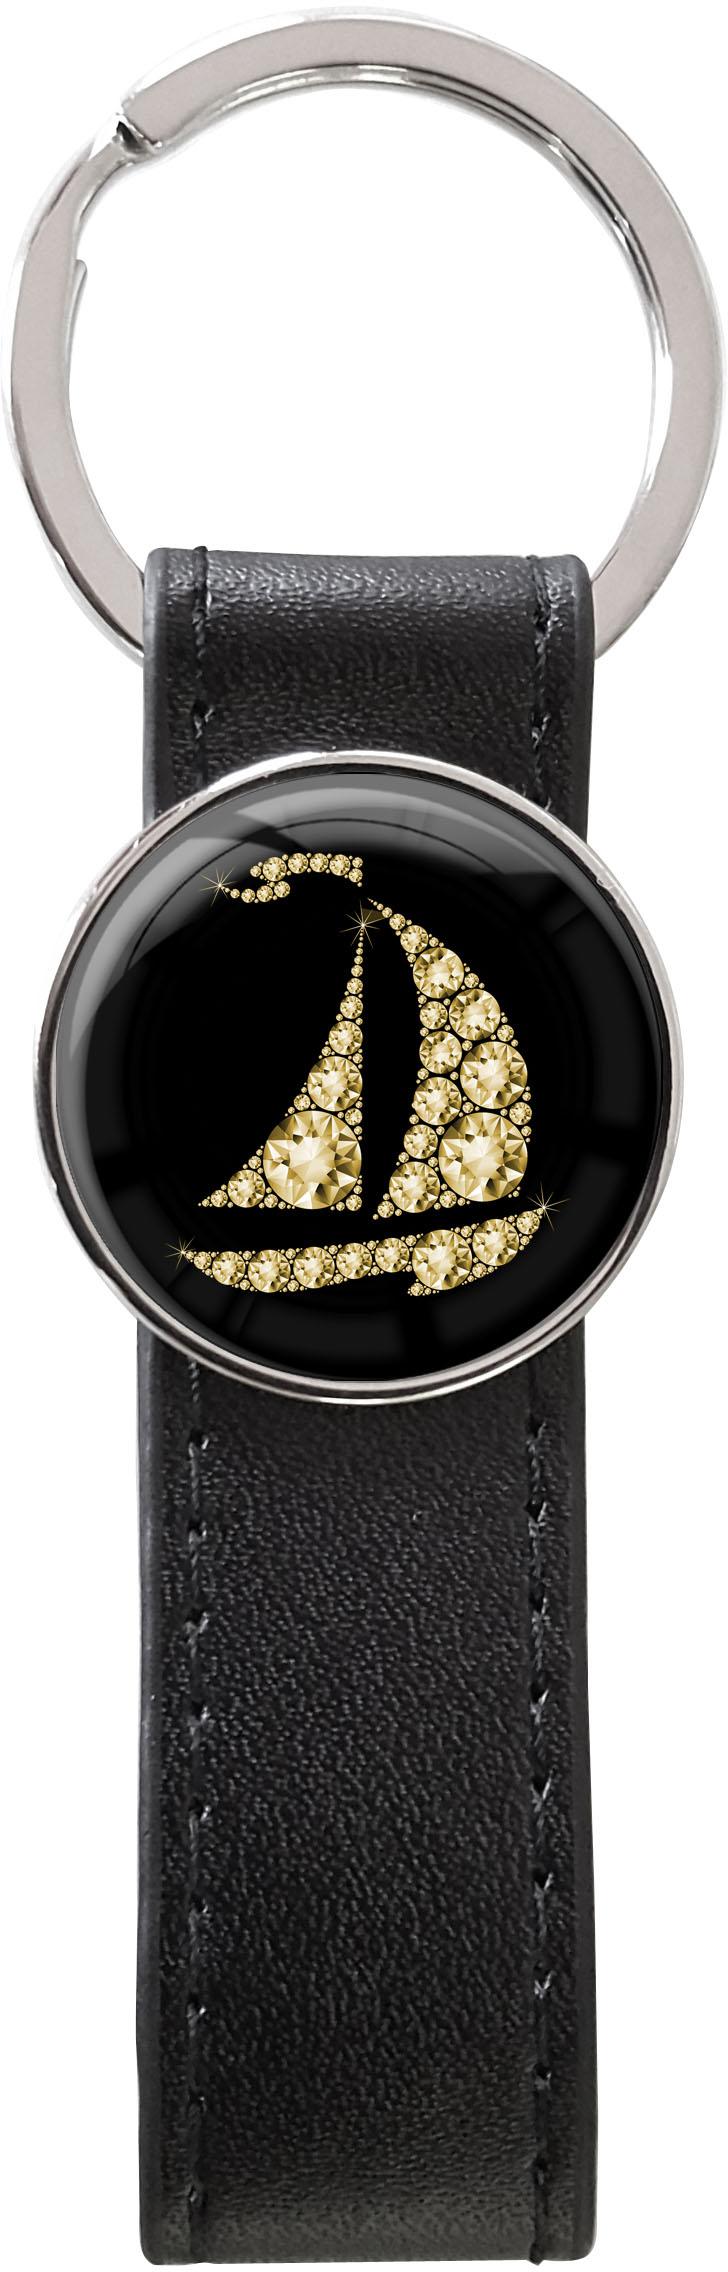 Schlüsselanhänger PU - Leder / Segelboot in Gold